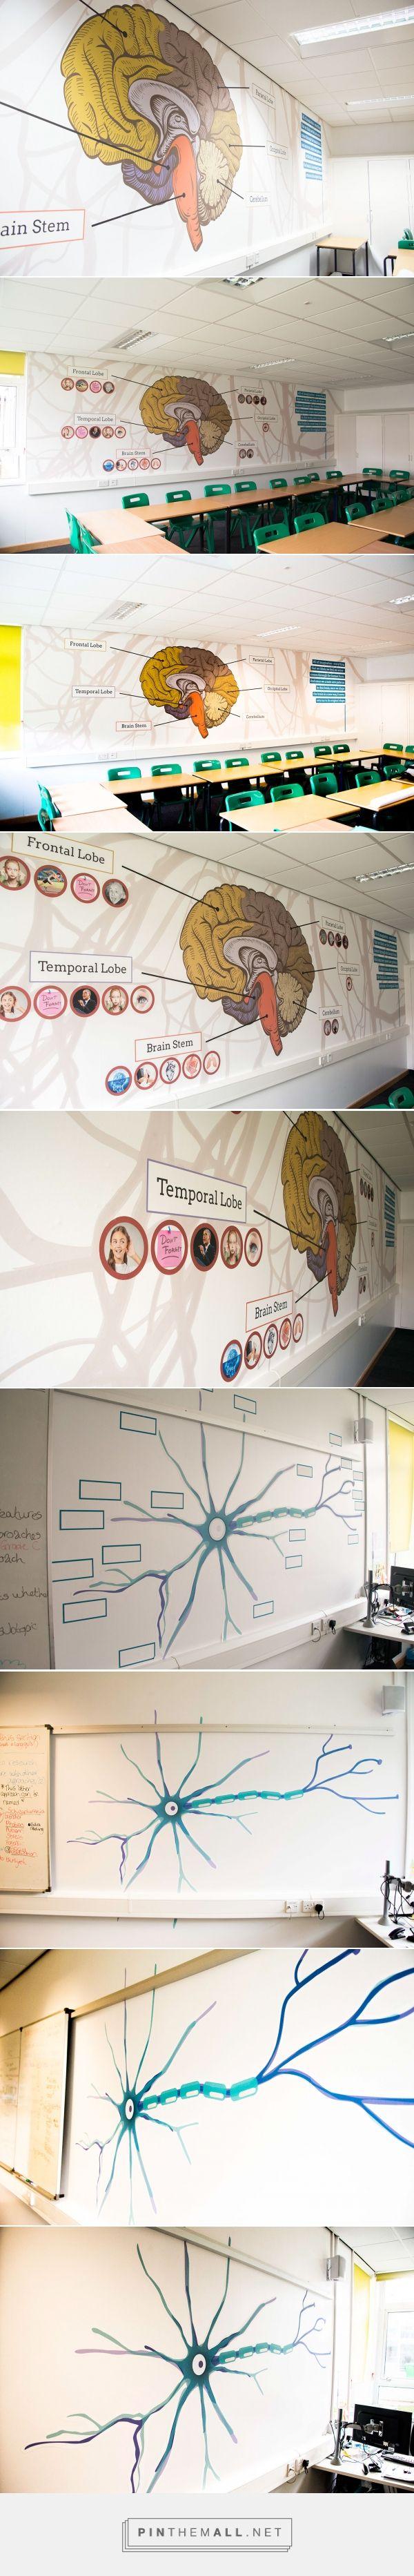 Psychology Classroom Design on Behance - by Andrew Heffernan